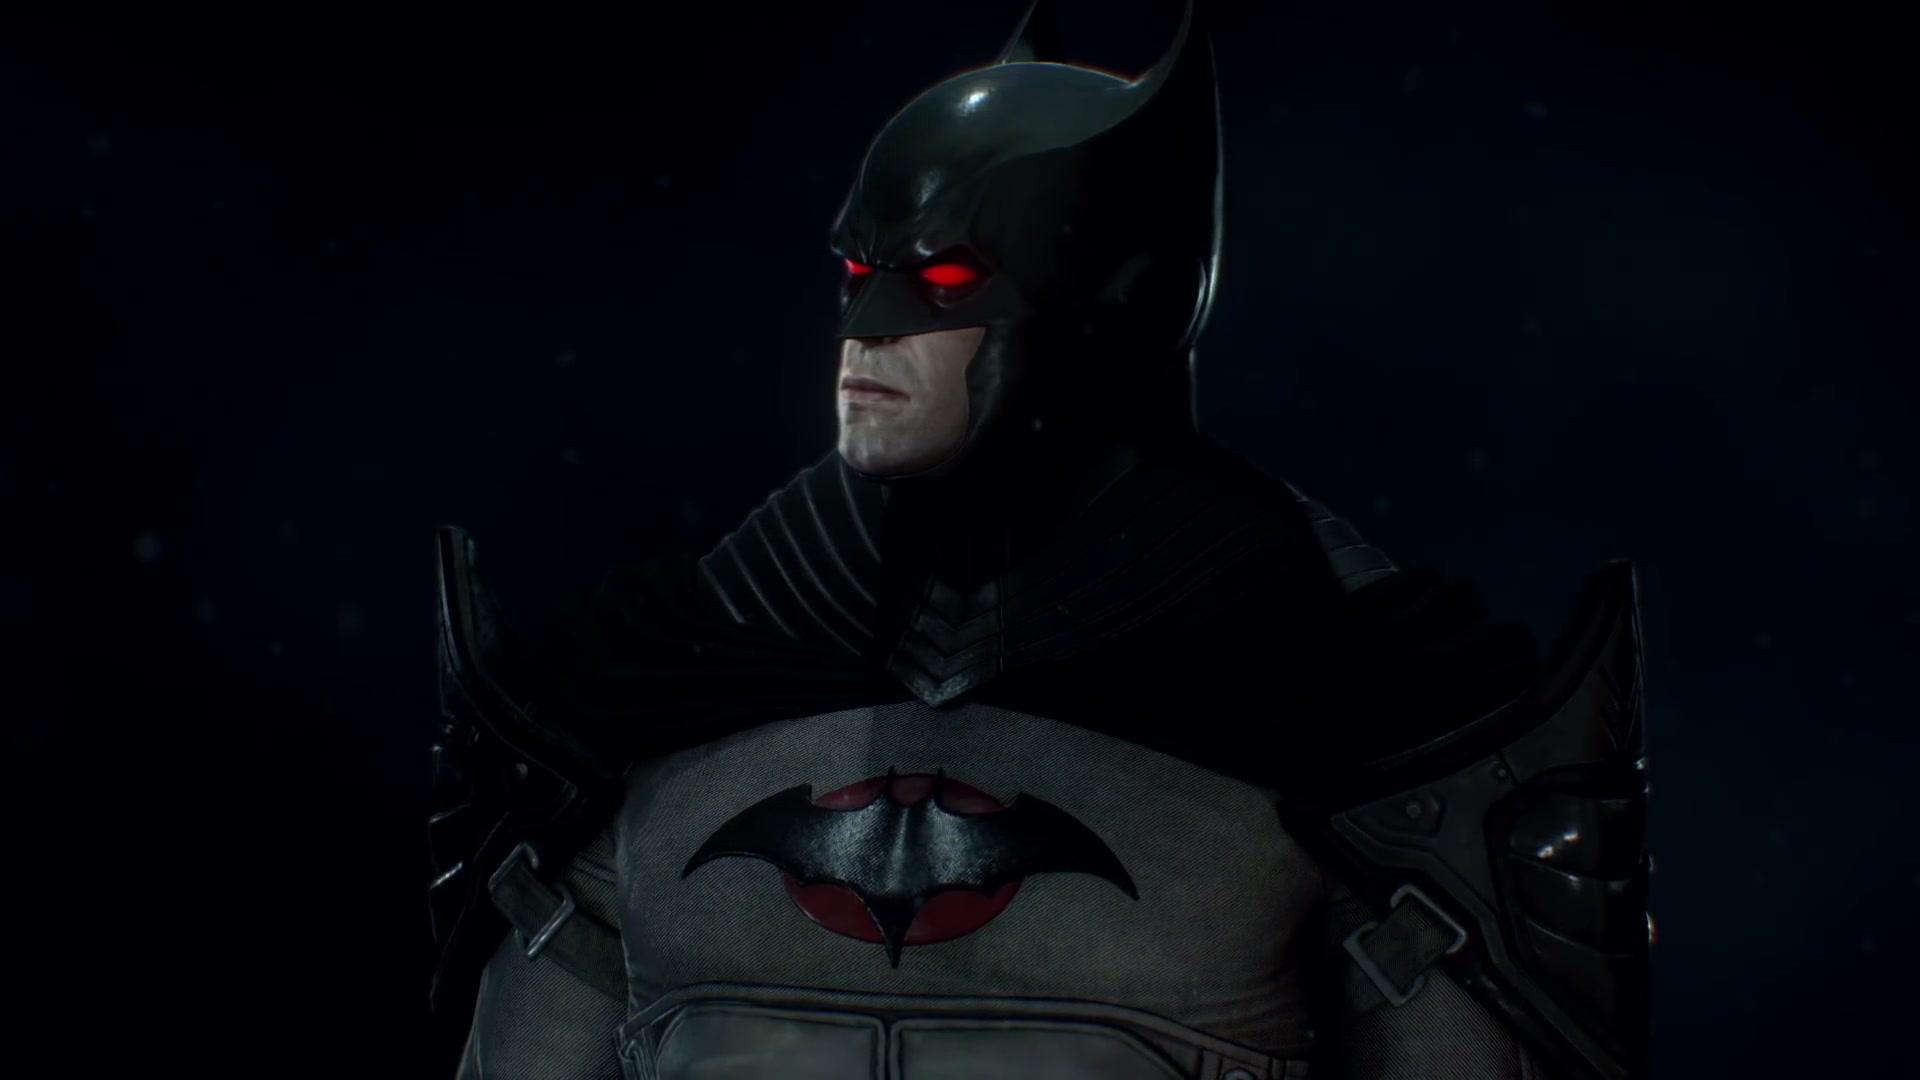 Image Batman Arkham Knight Batman Flashpoint Skin Showcase 70